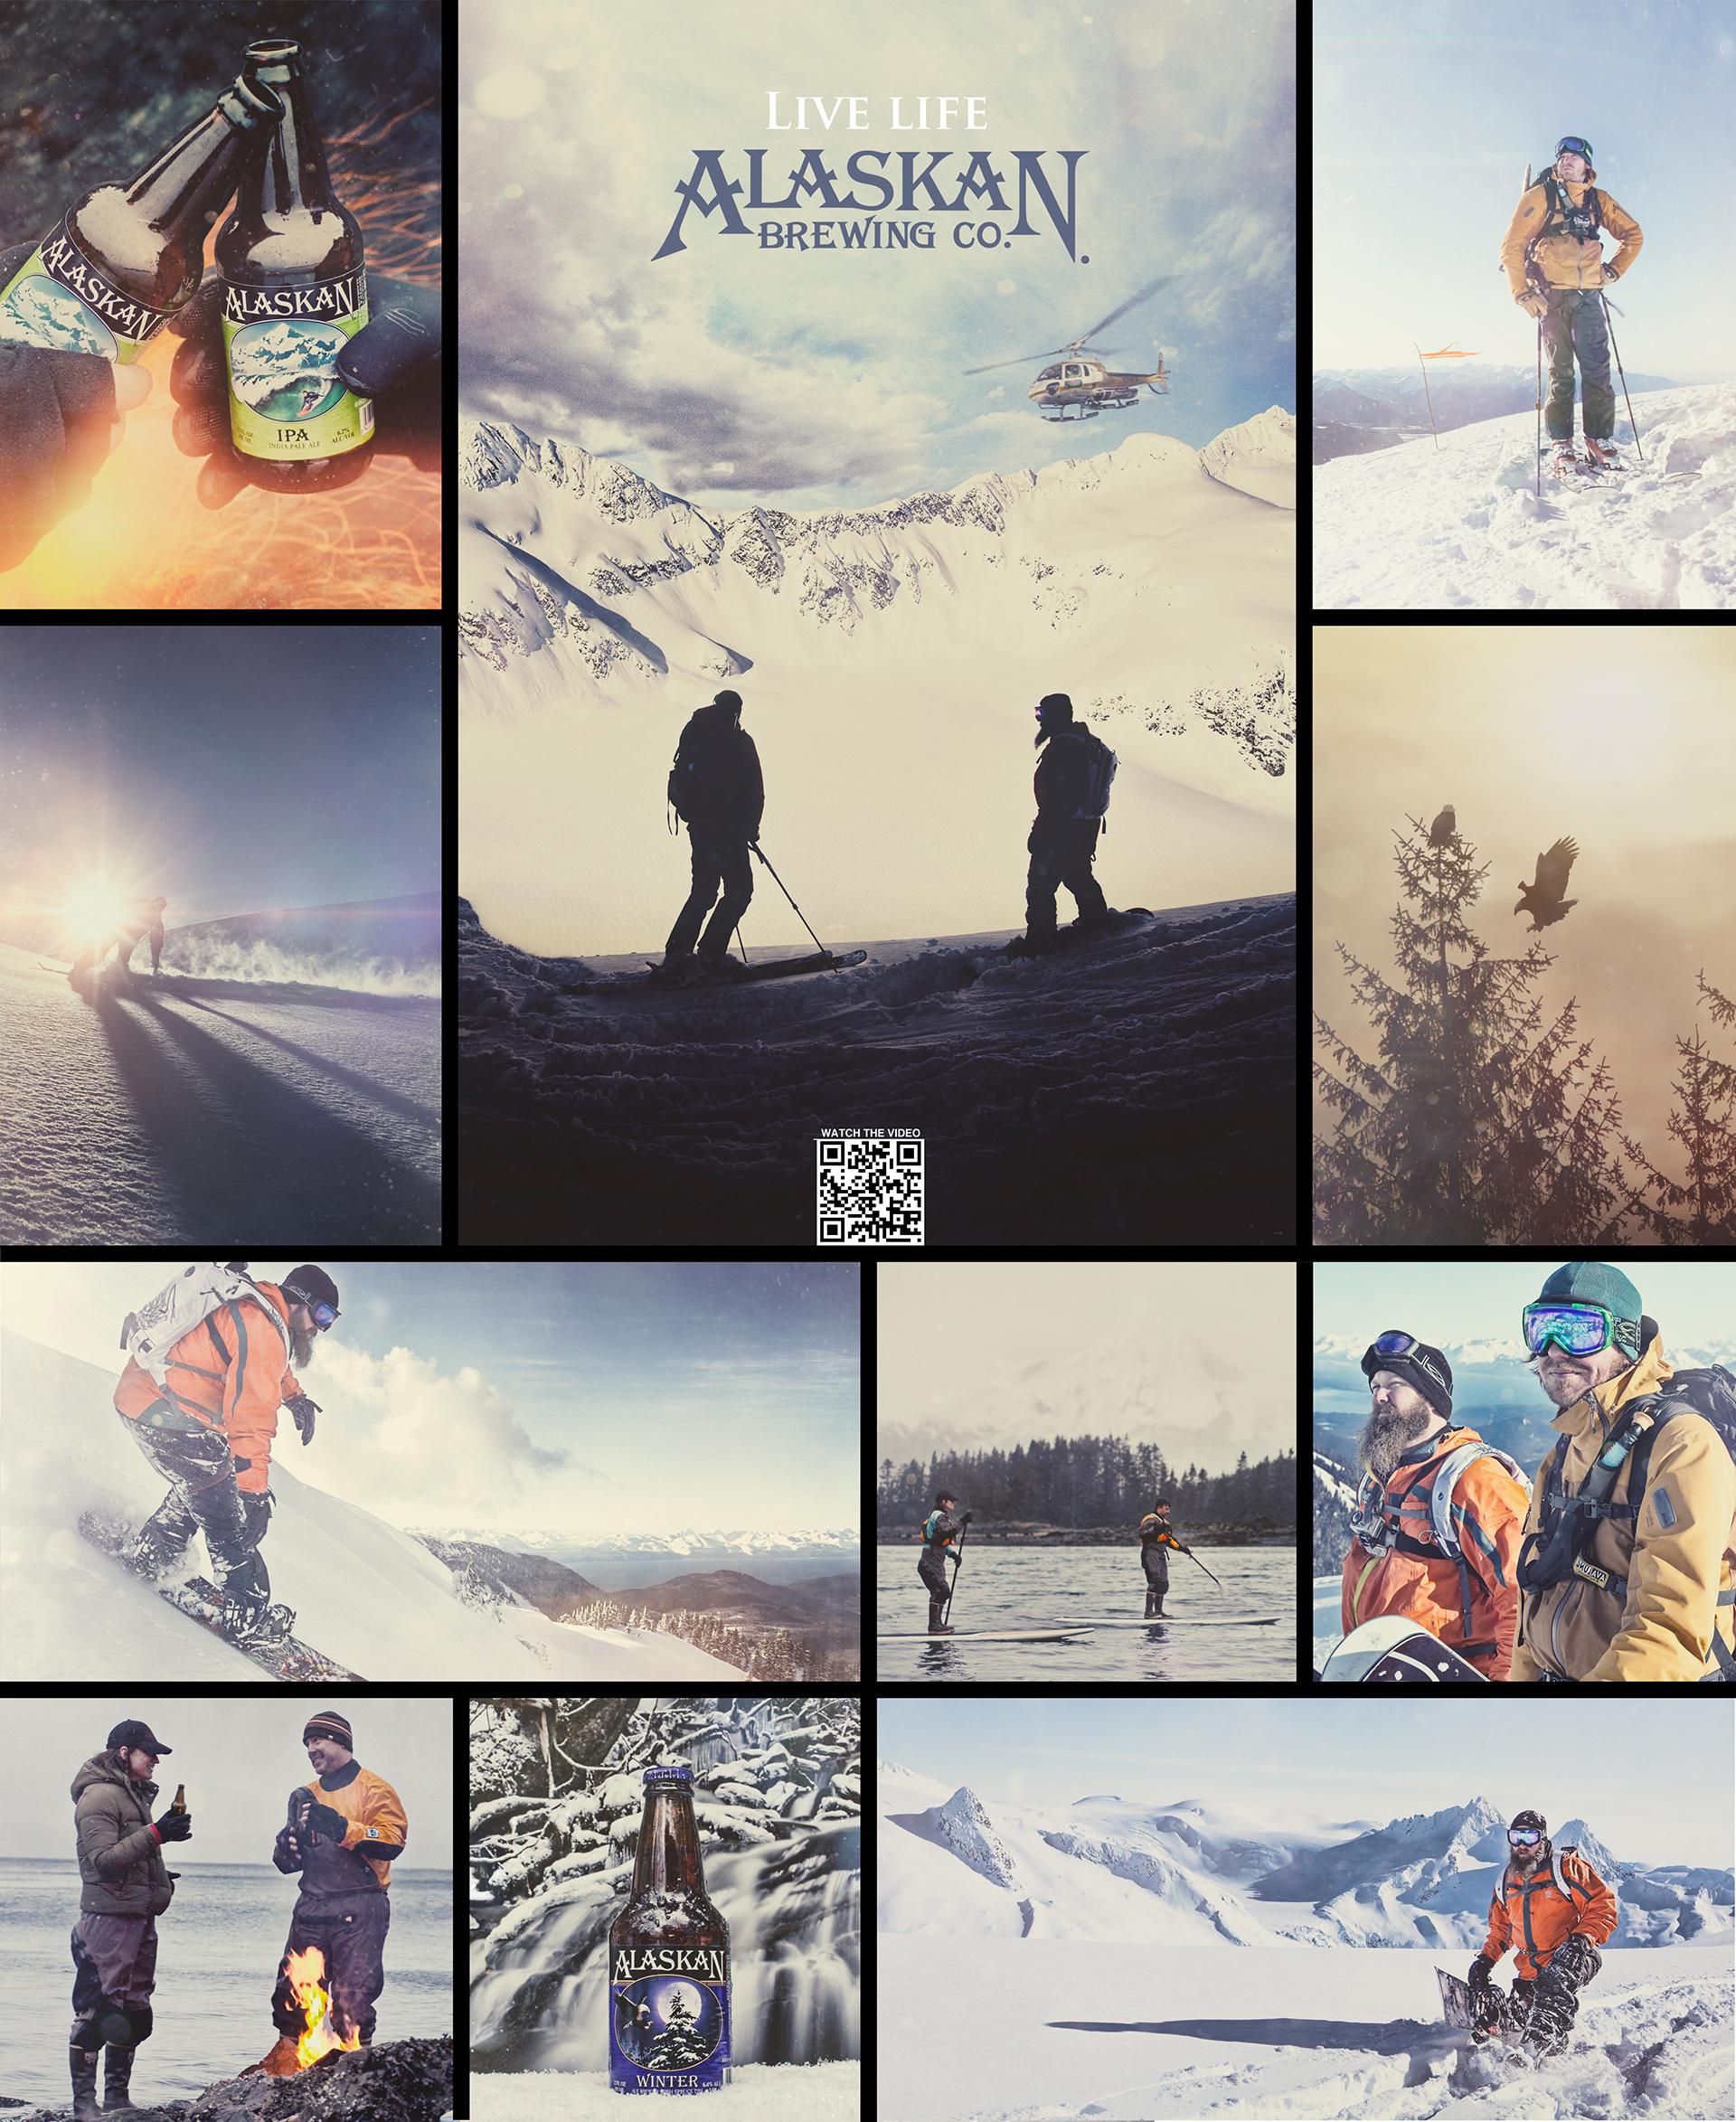 Redtail-AlaskanBC-Ads-004.jpg